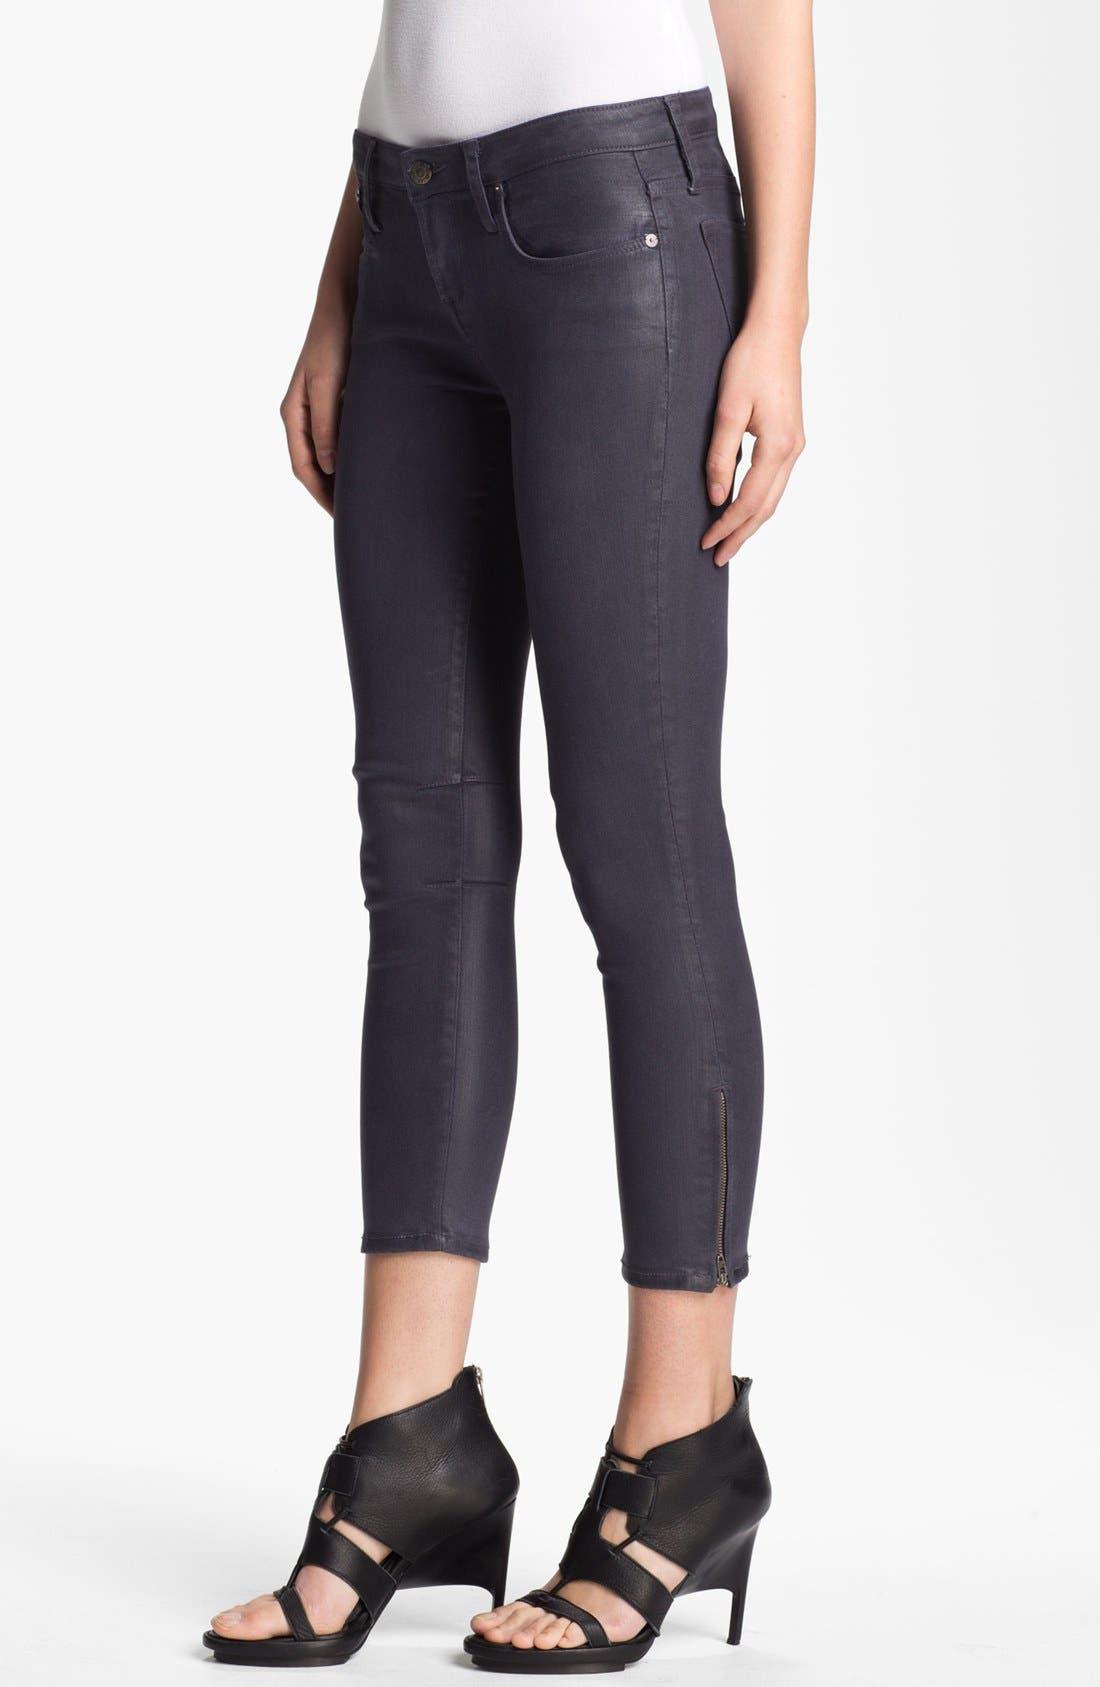 Main Image - HELMUT Helmut Lang 'High Gloss Halo' Skinny Crop Jeans